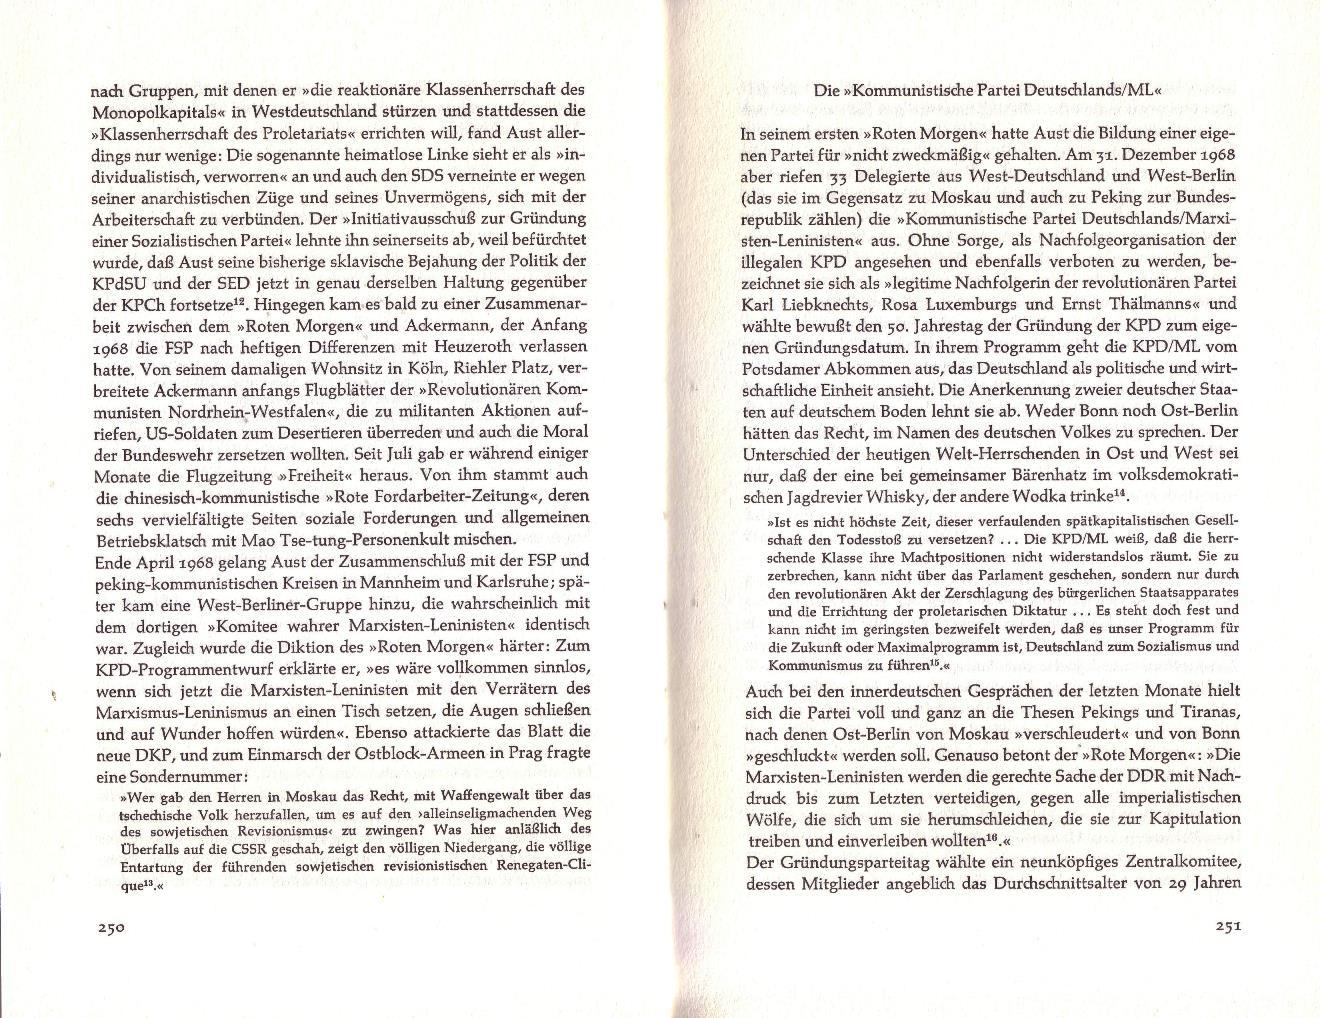 Schlomann_Friedlingstein_Die_Maoisten_0131